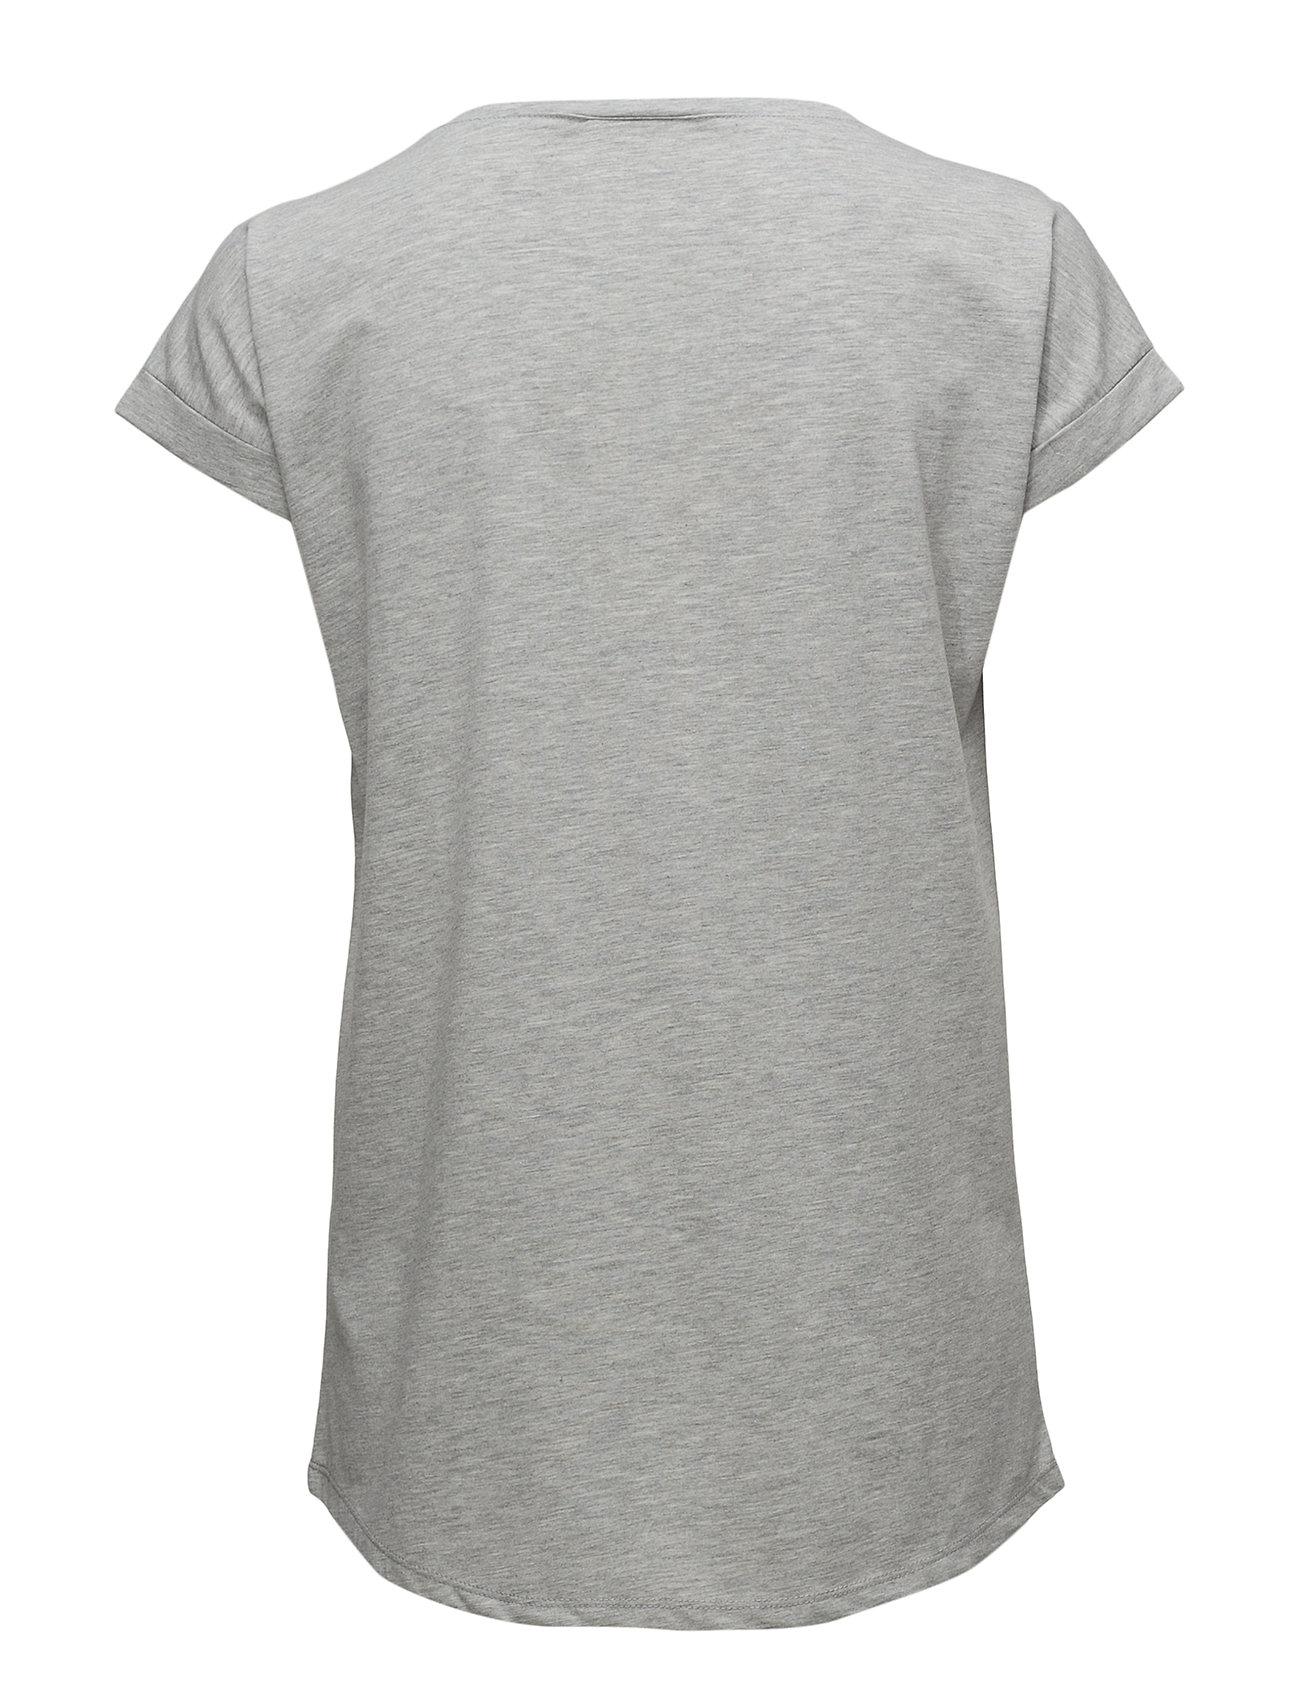 Vidreamers Pure T Shirt Noos T shirt Top Grå VILA